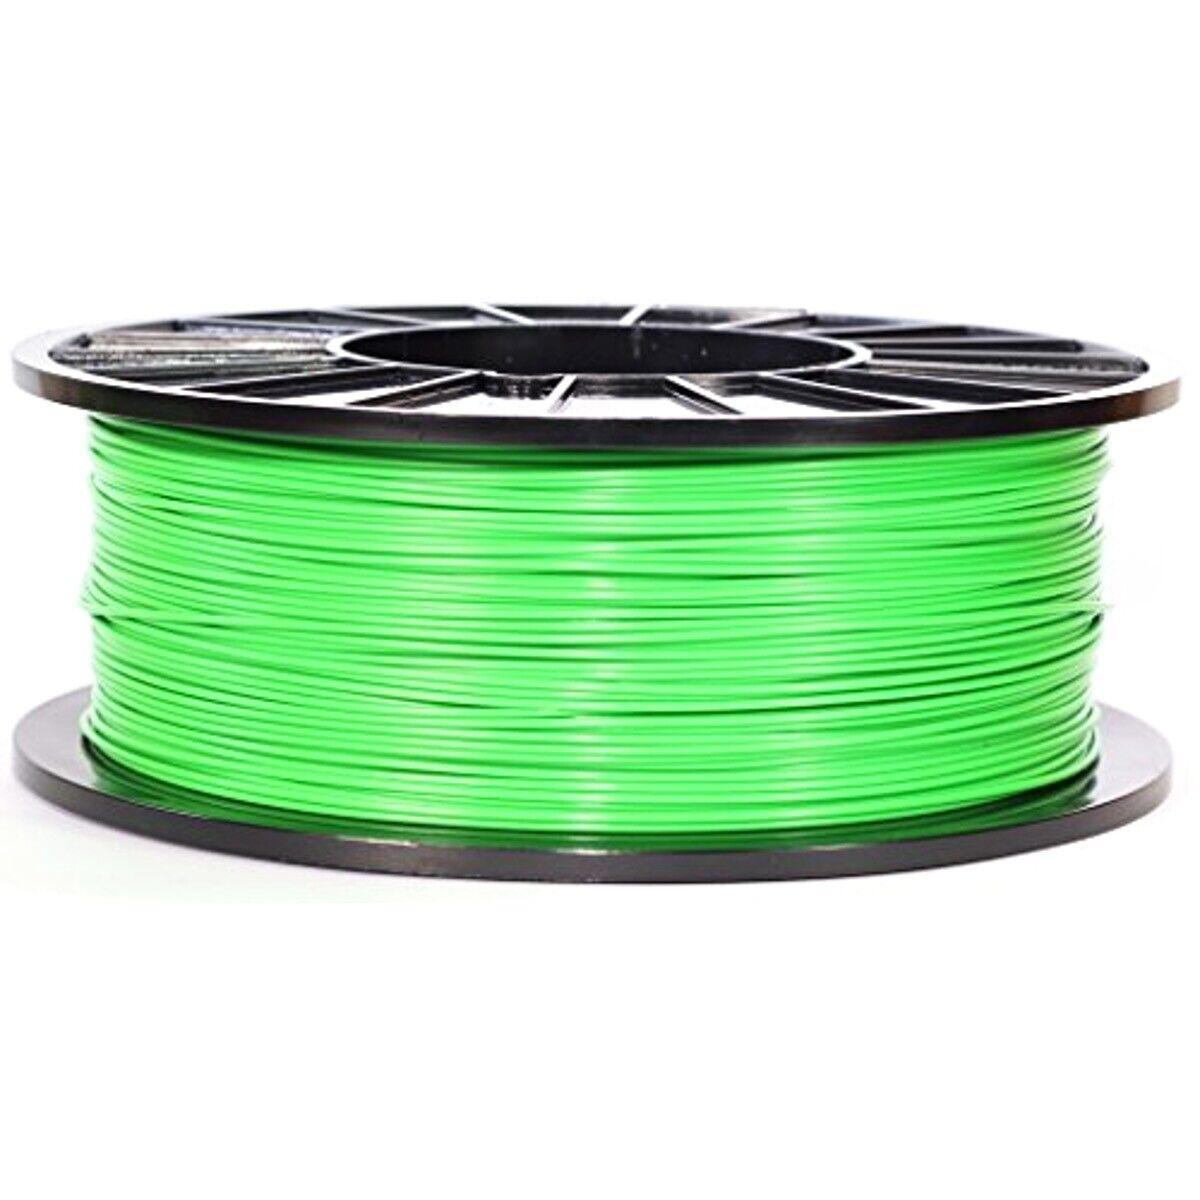 [3DMakerWorld] Premium PLA Filament - 1.75mm, 1kg, Green